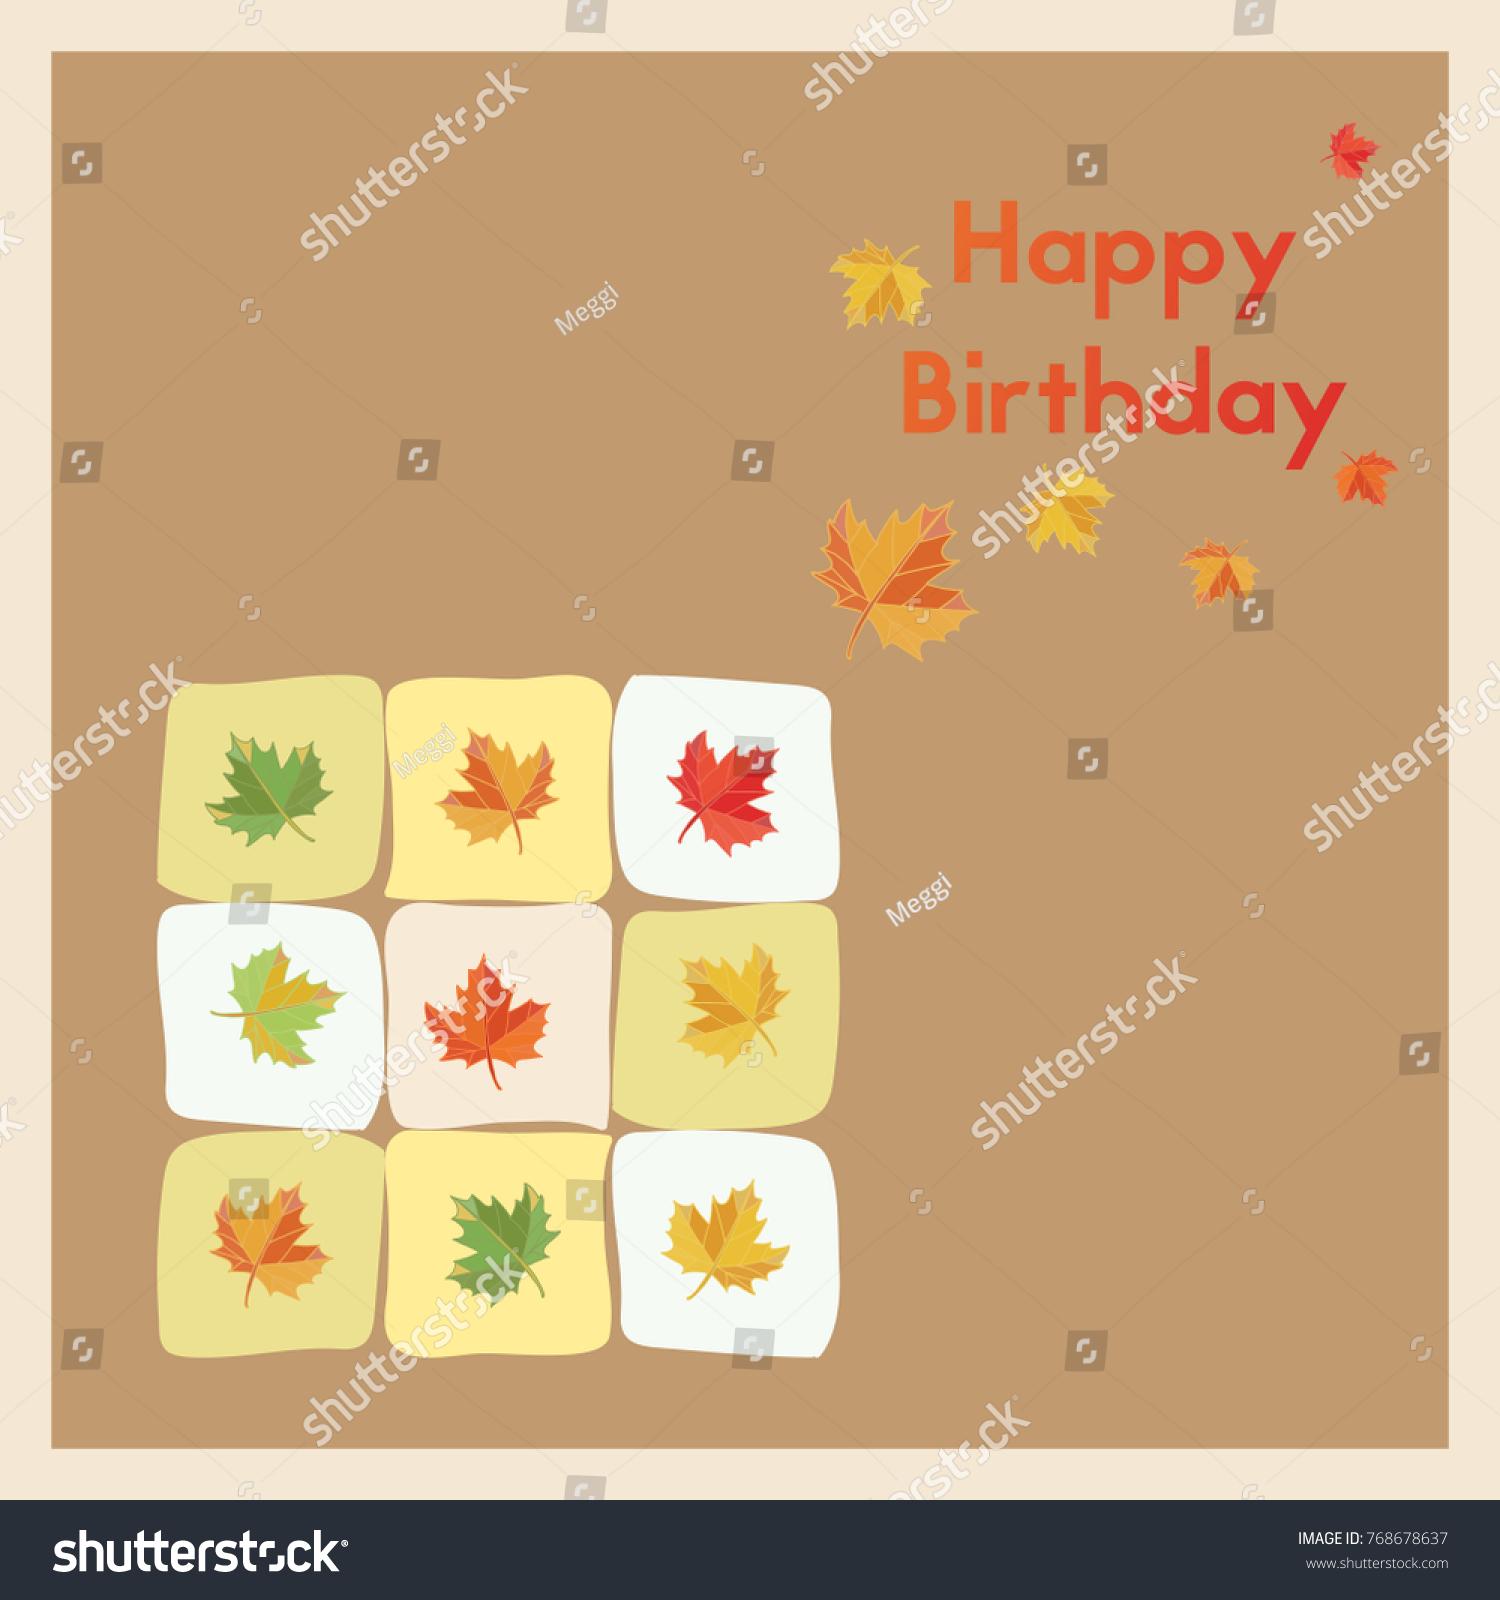 Happy Birthday Greeting Birth Card Autumn Stock Illustration